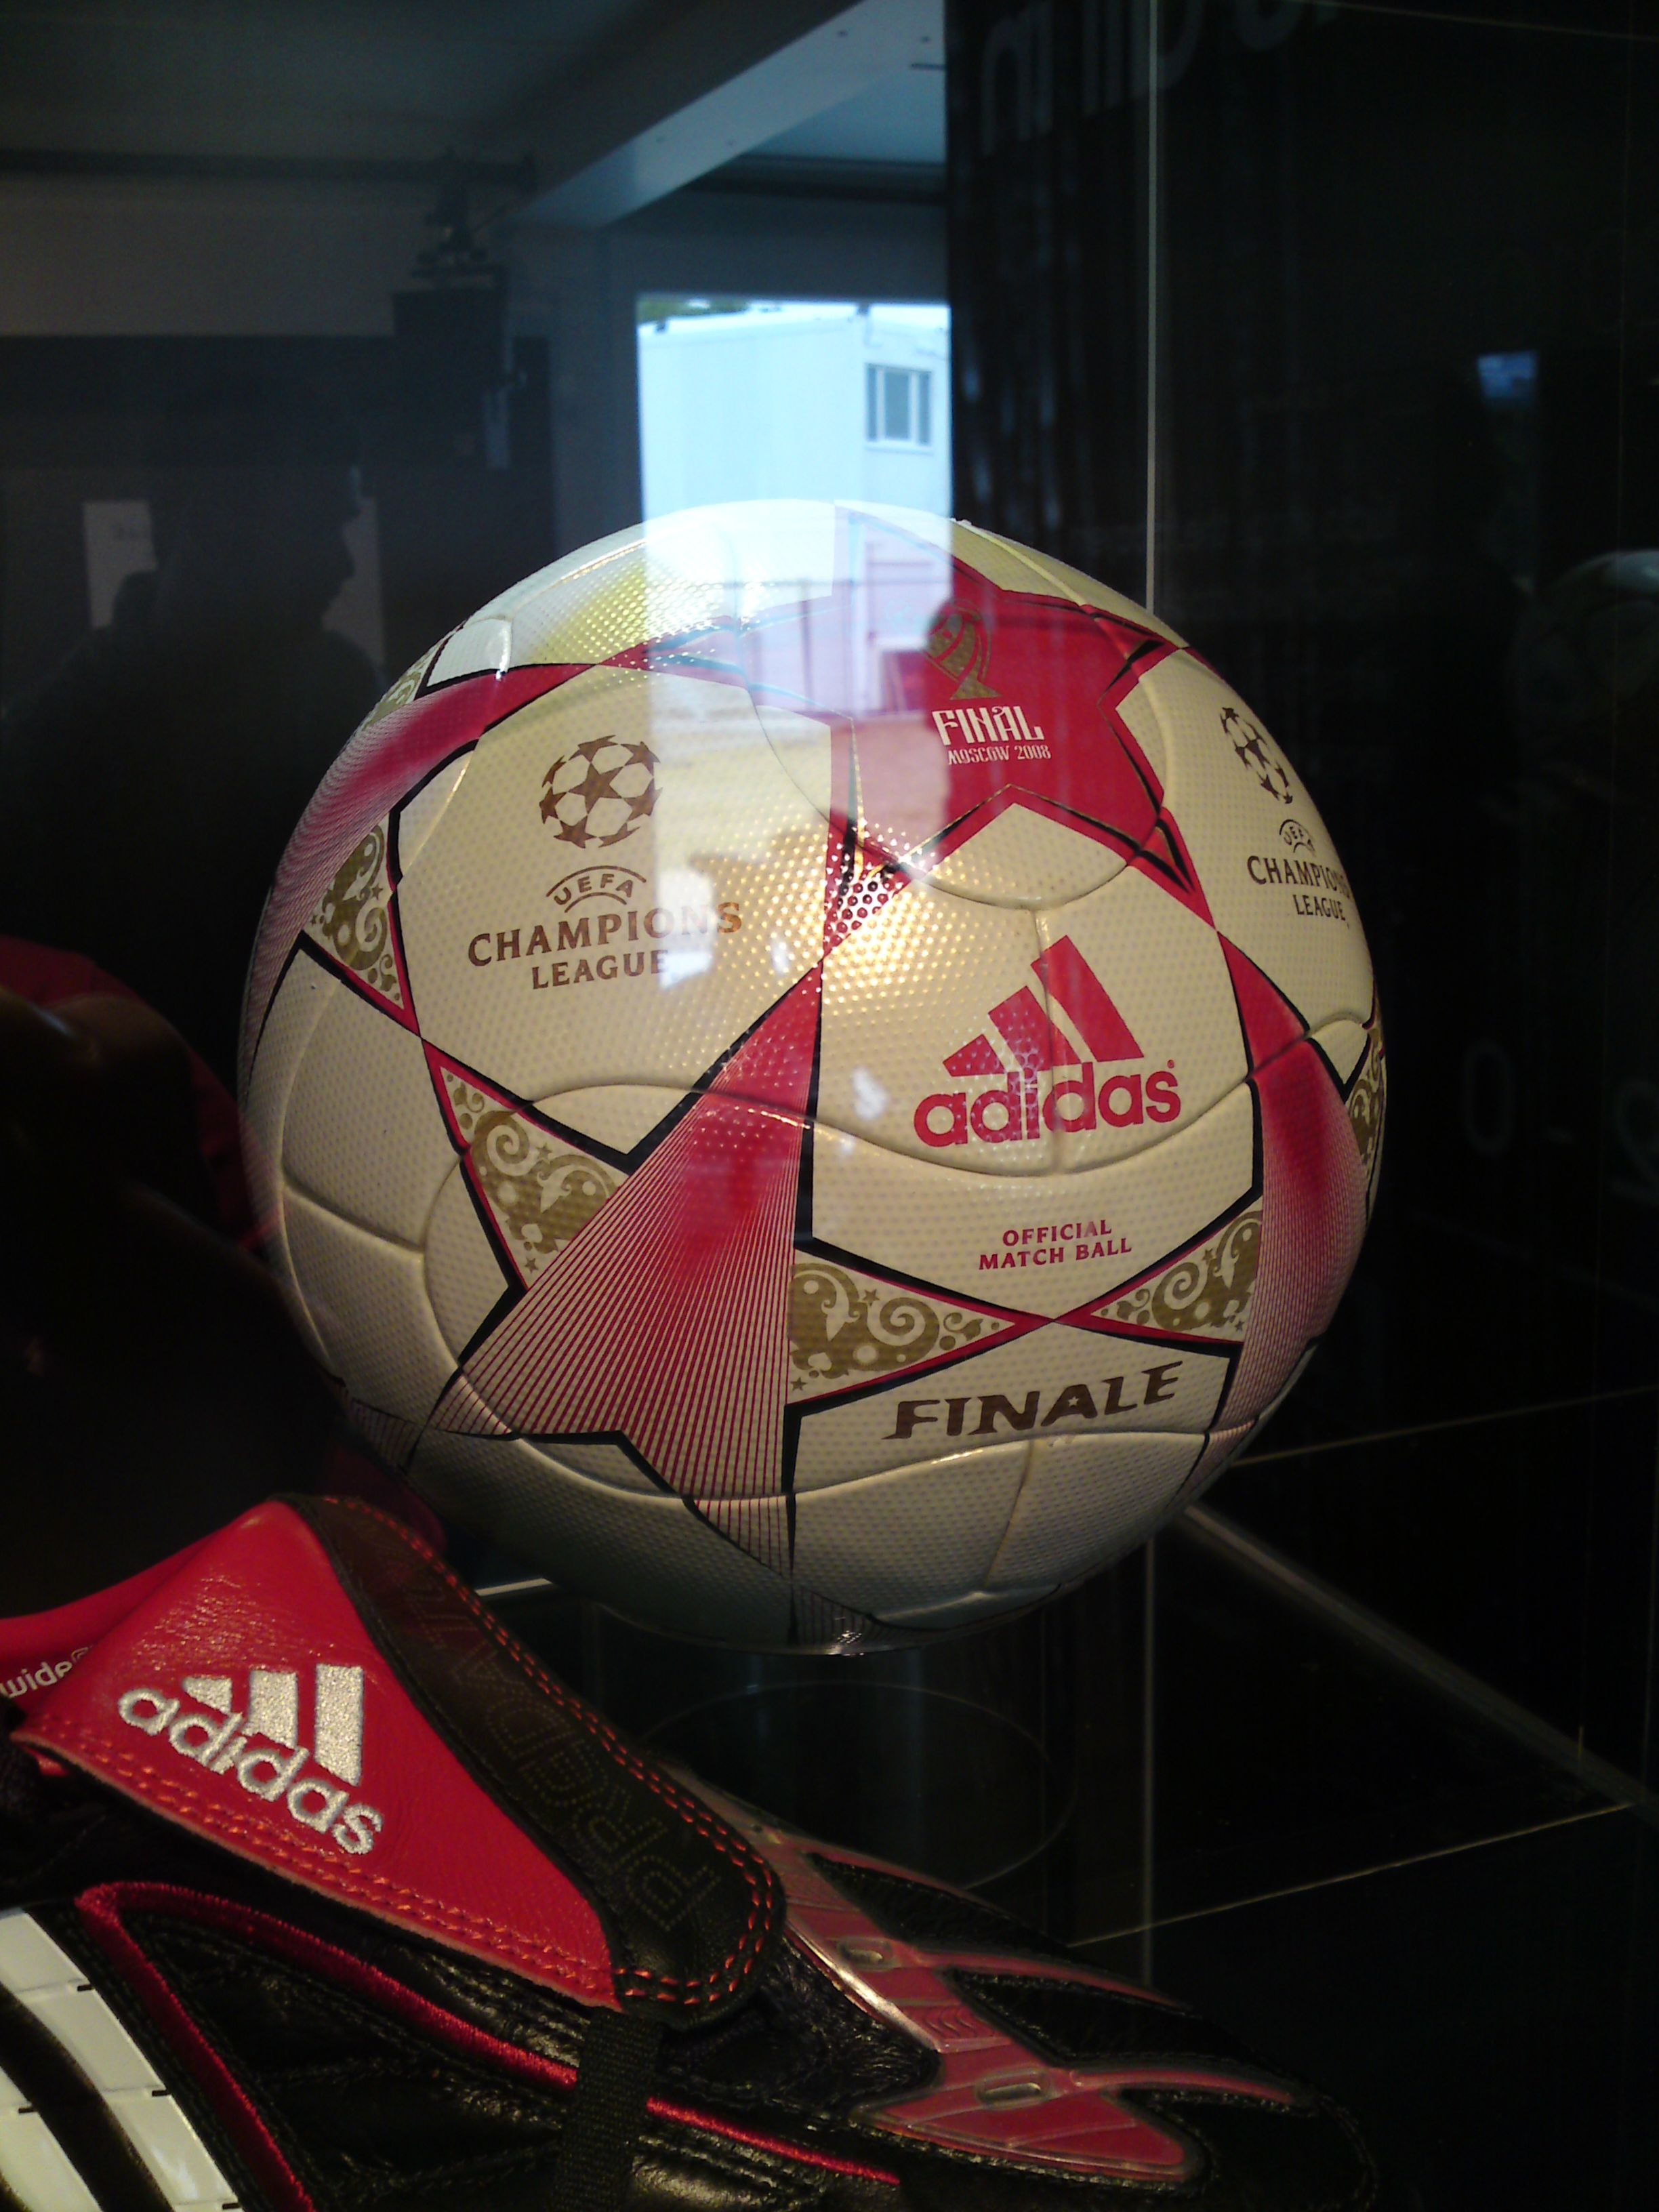 file 2008 uefa champions league final ball uefa champions festival jpg wikimedia commons file 2008 uefa champions league final